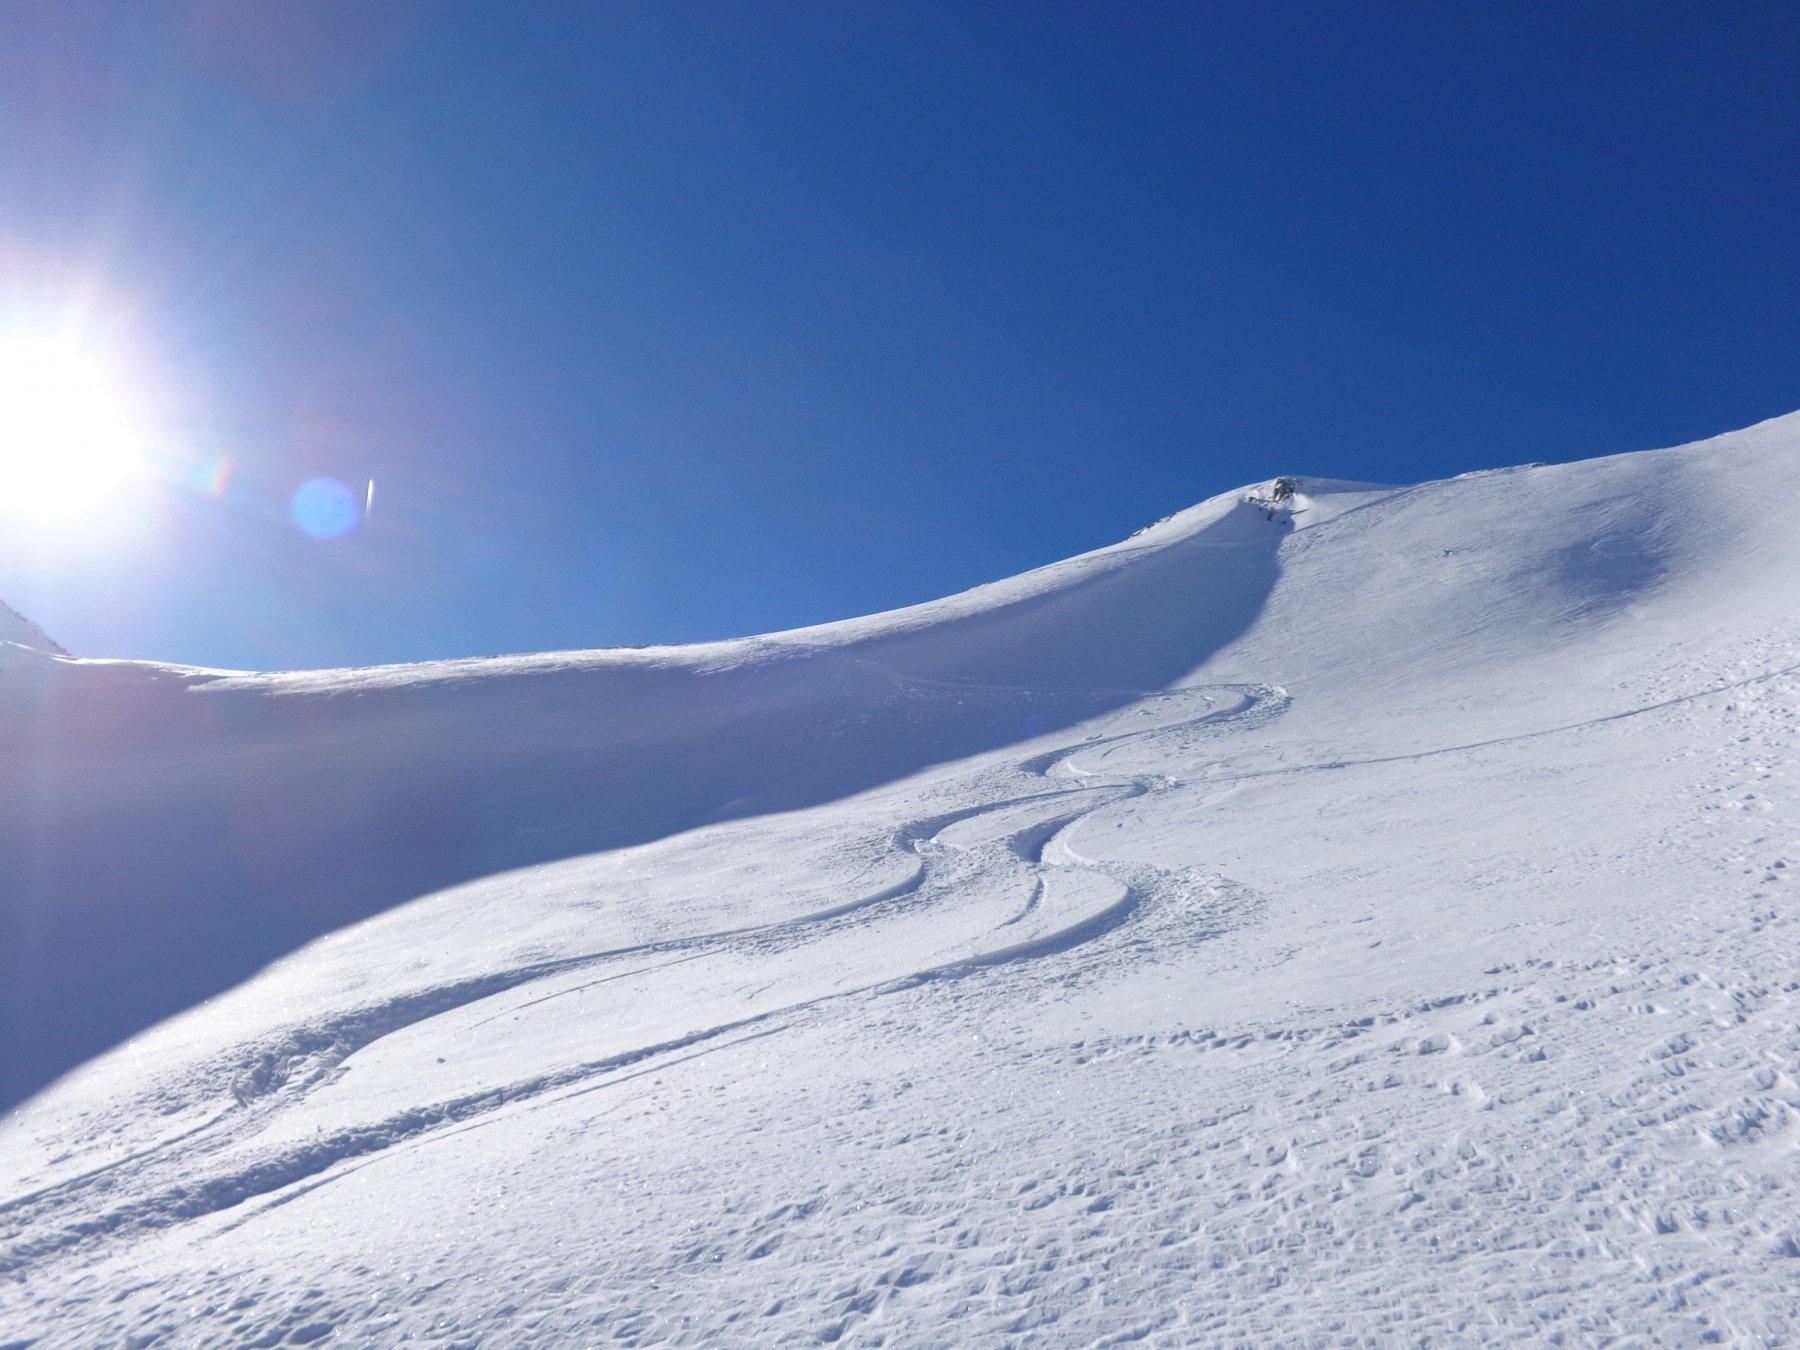 bella neve